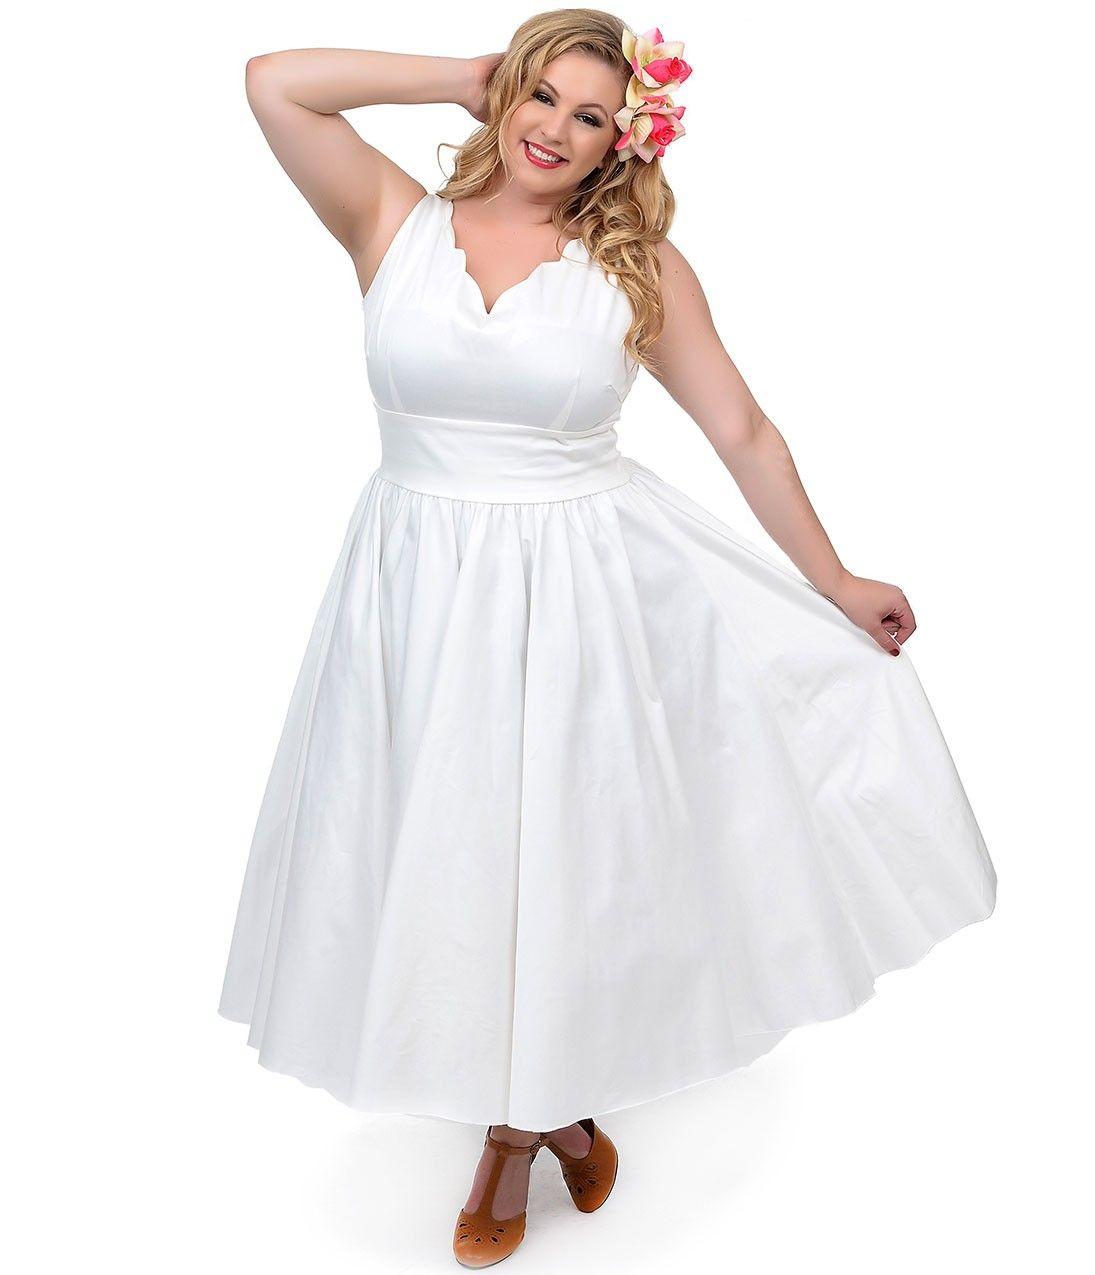 Plus size pin up style wedding dress  Plus Size s Style Ivory Cotton Sateen Scallop Brenda Swing Dress